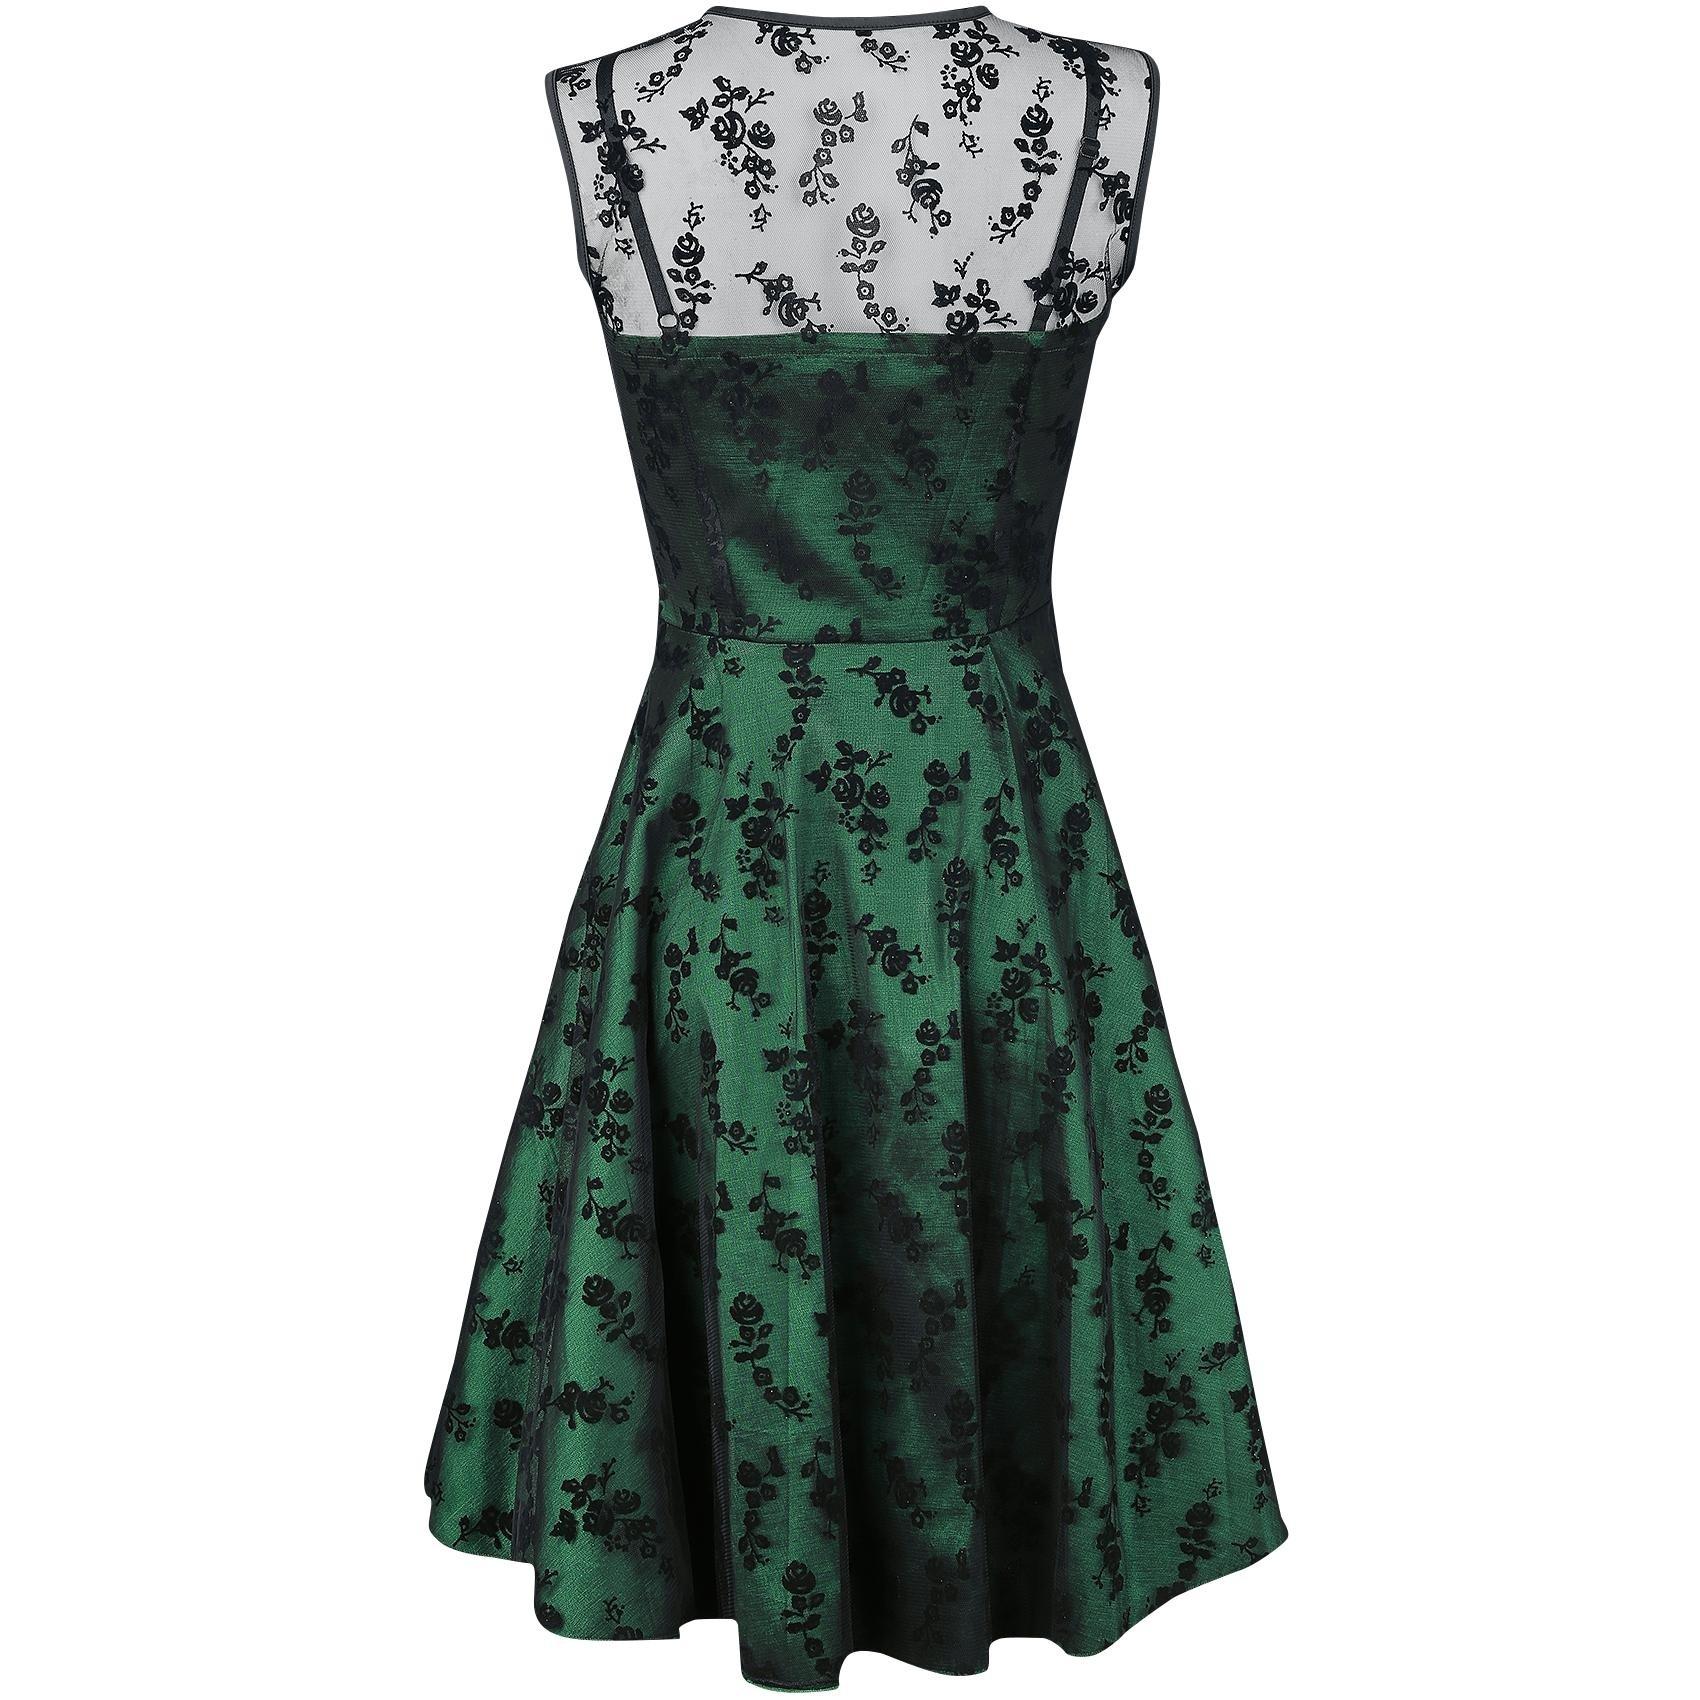 Perfekt Grünes Kleid Kurz VertriebFormal Leicht Grünes Kleid Kurz Vertrieb